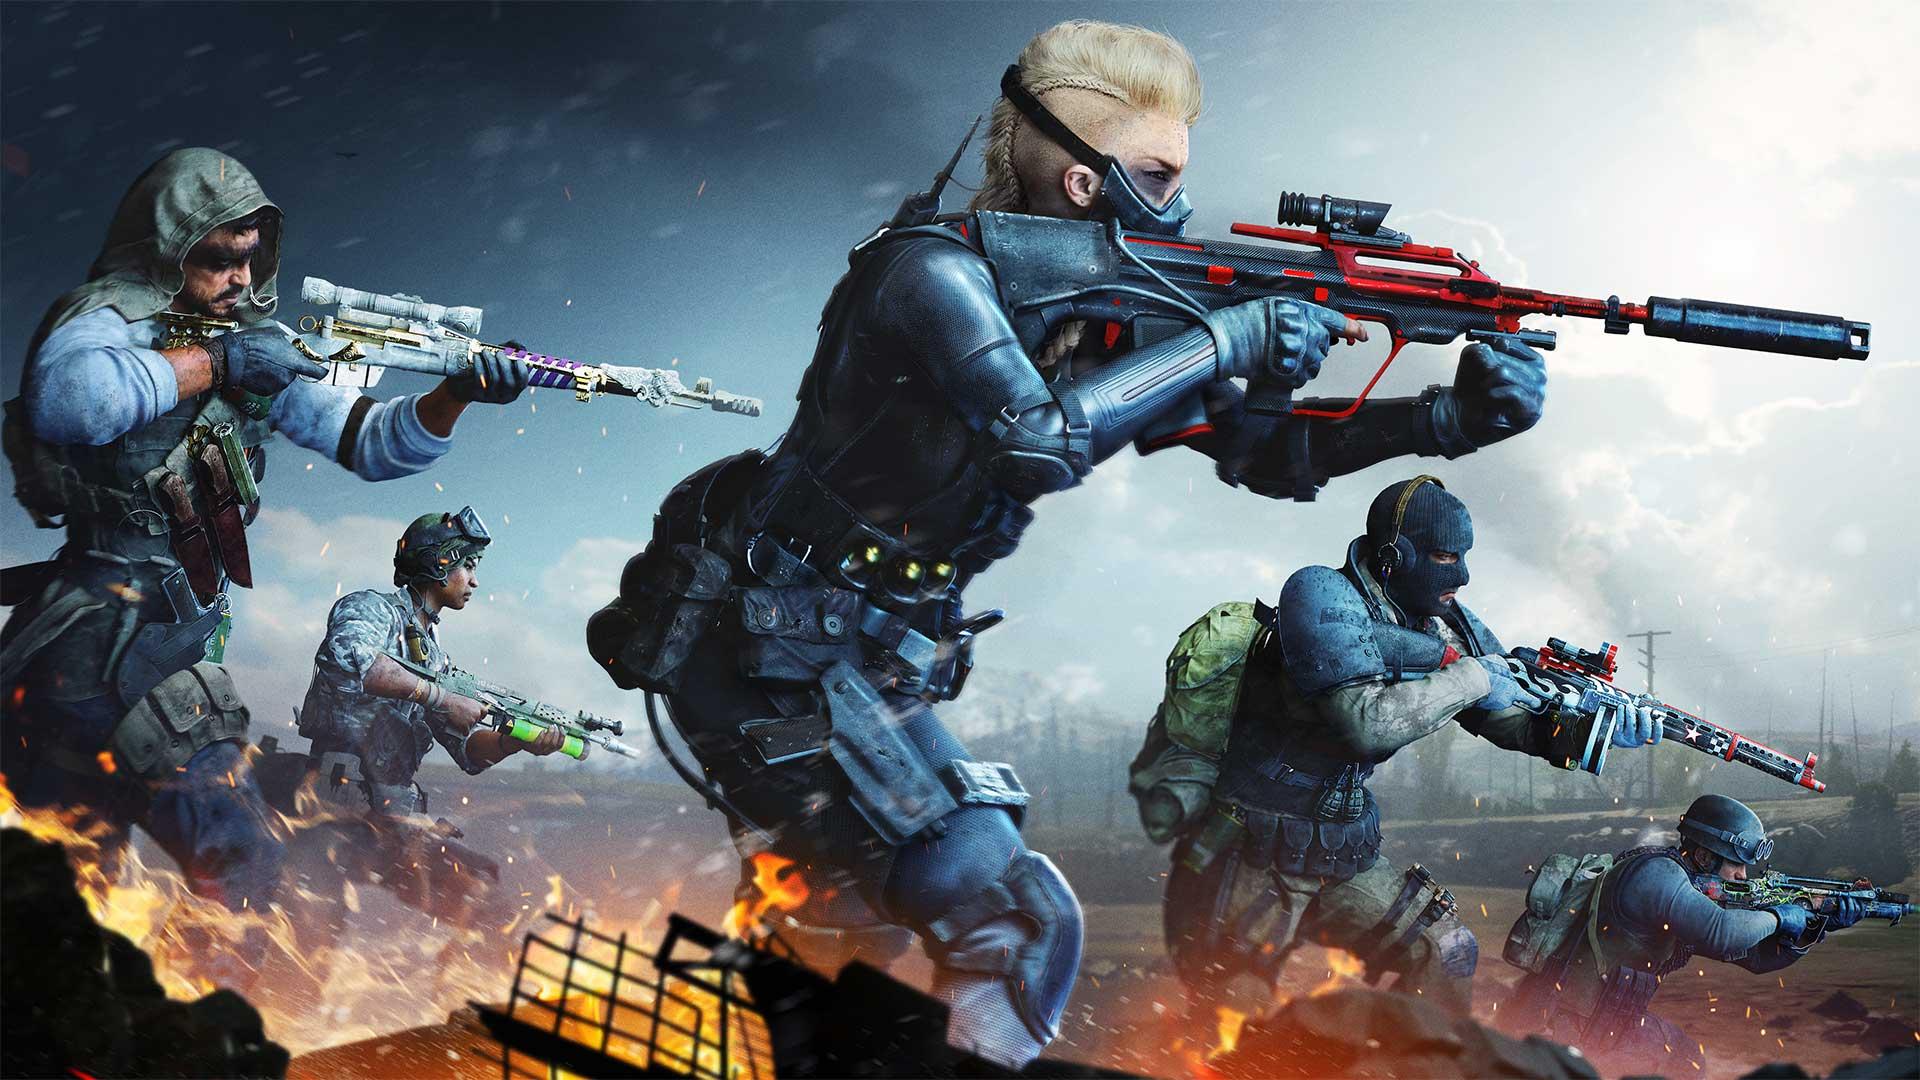 Слух: код античита для Call of Duty: Warzone и Vanguard слили в Сеть